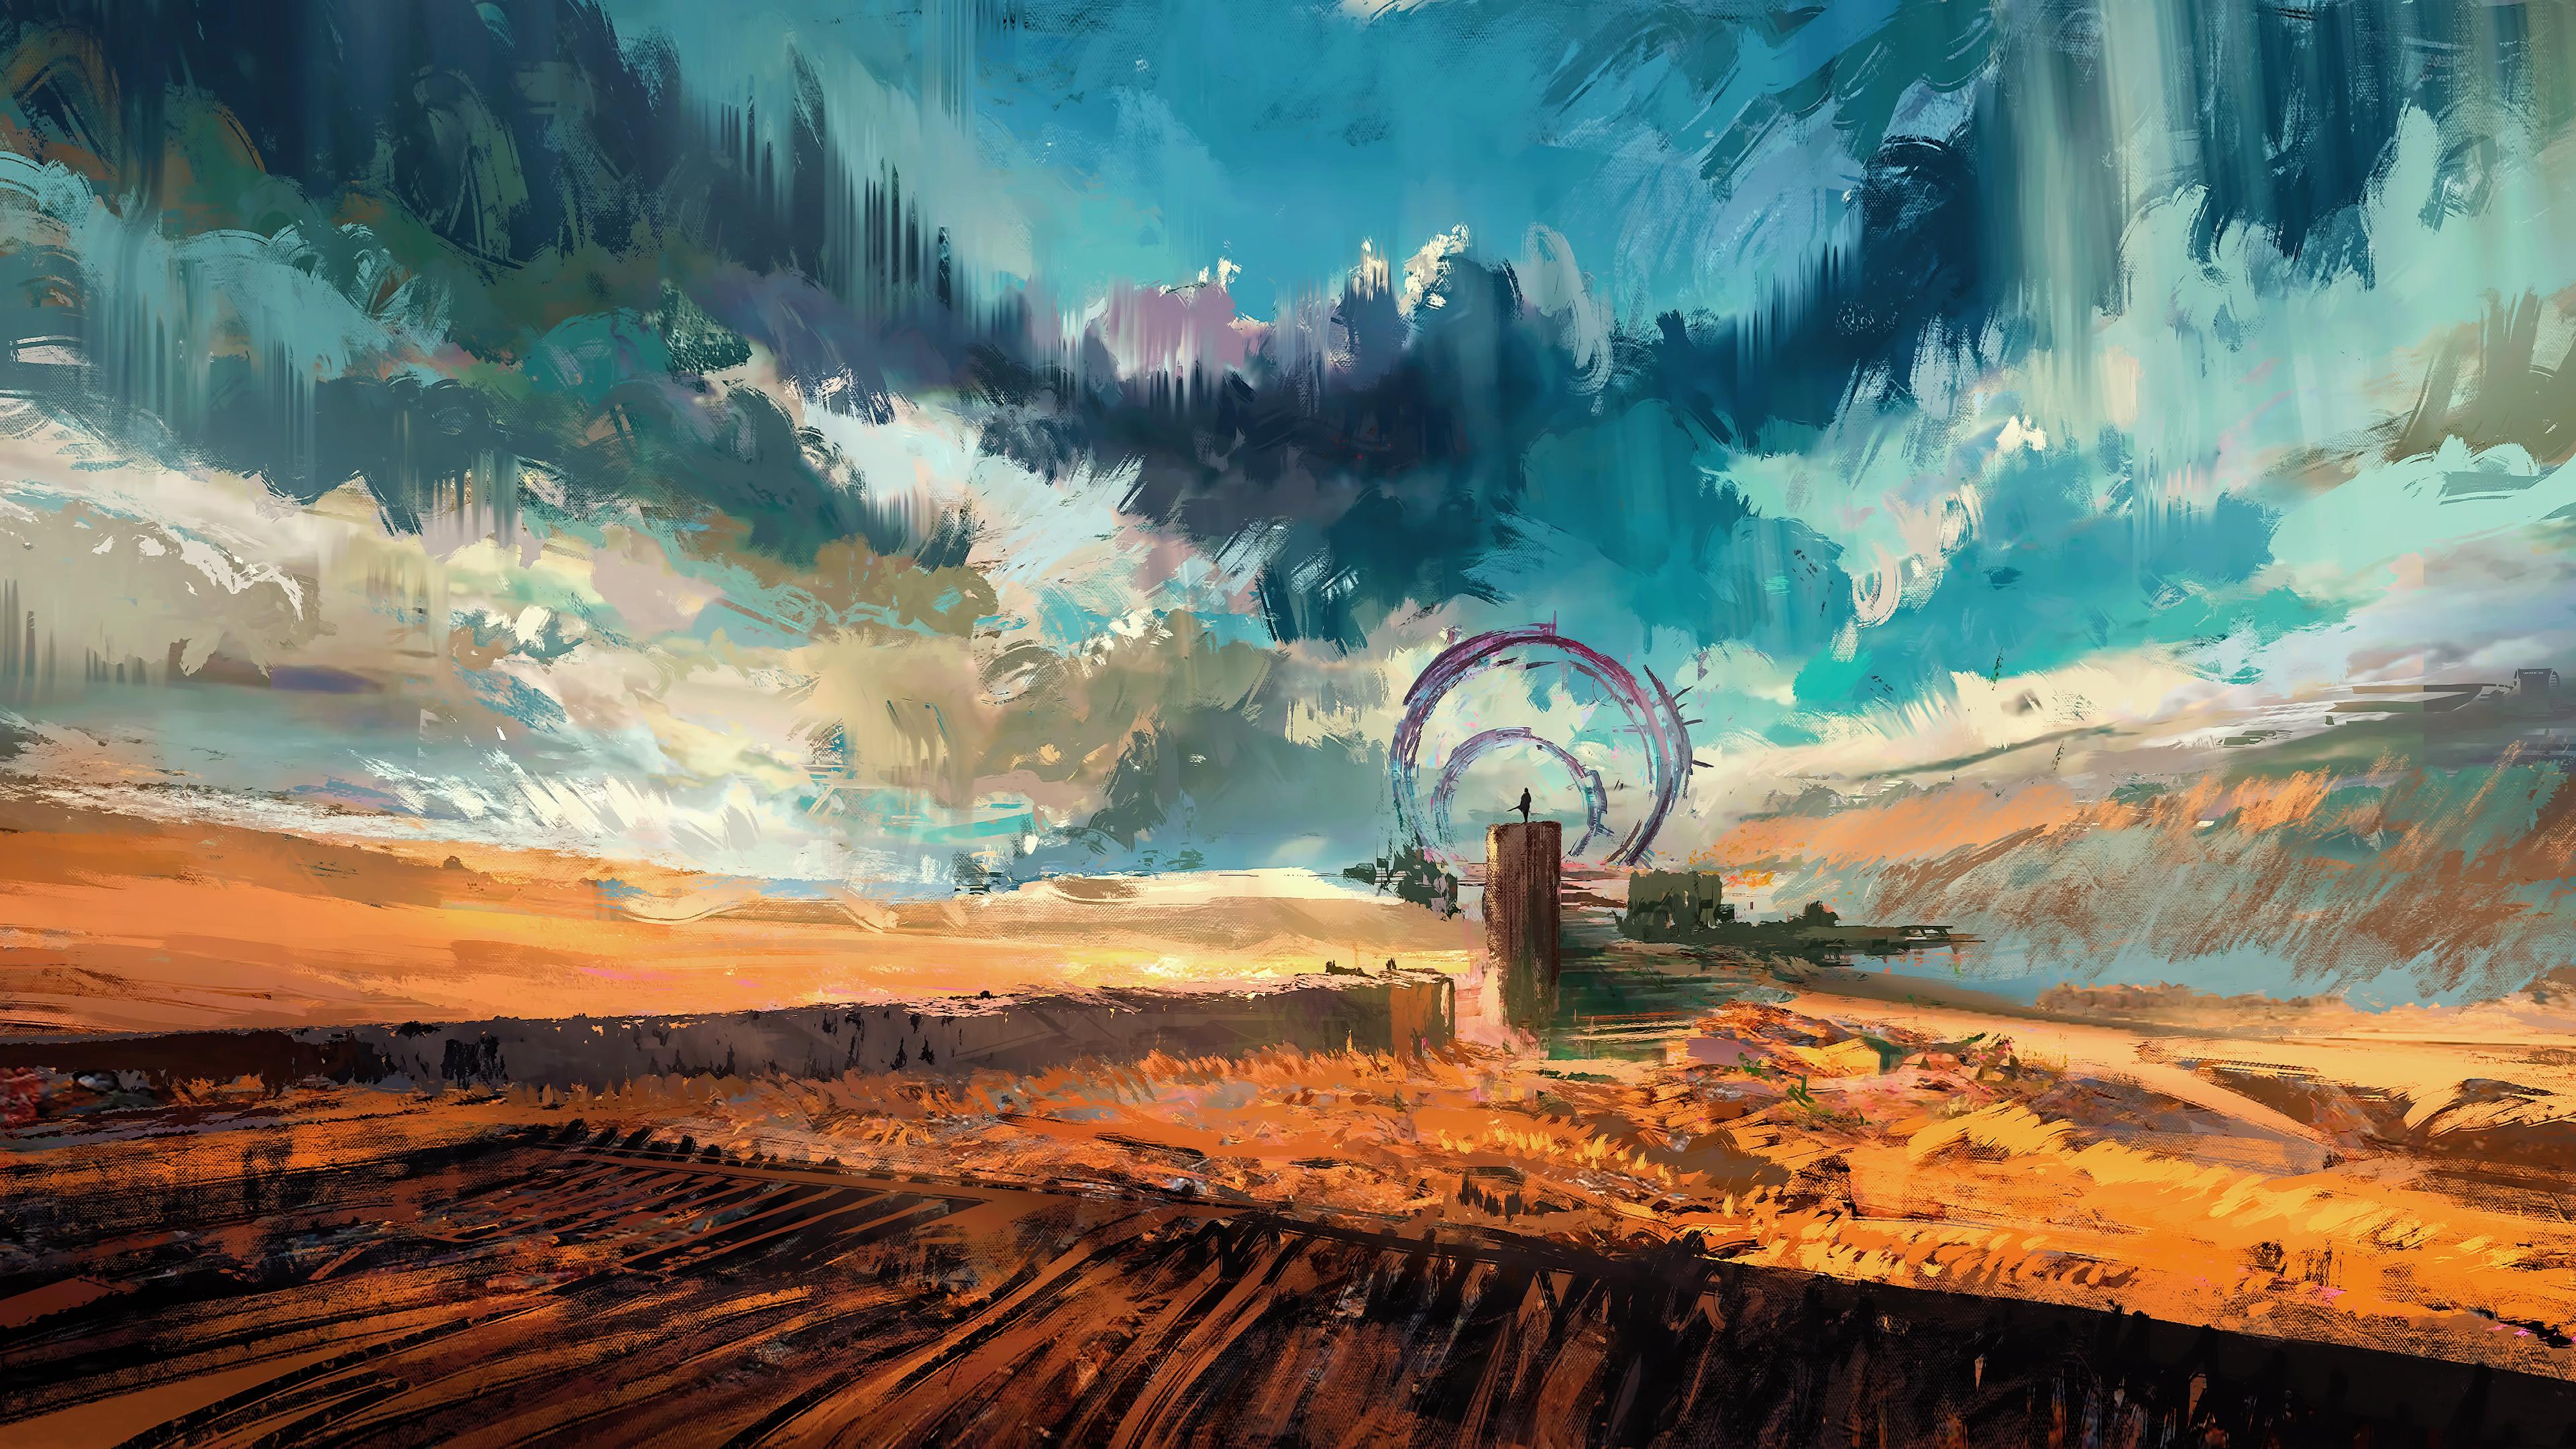 4k science fiction wallpapers cyber hd artwork digital artist backgrounds widescreen